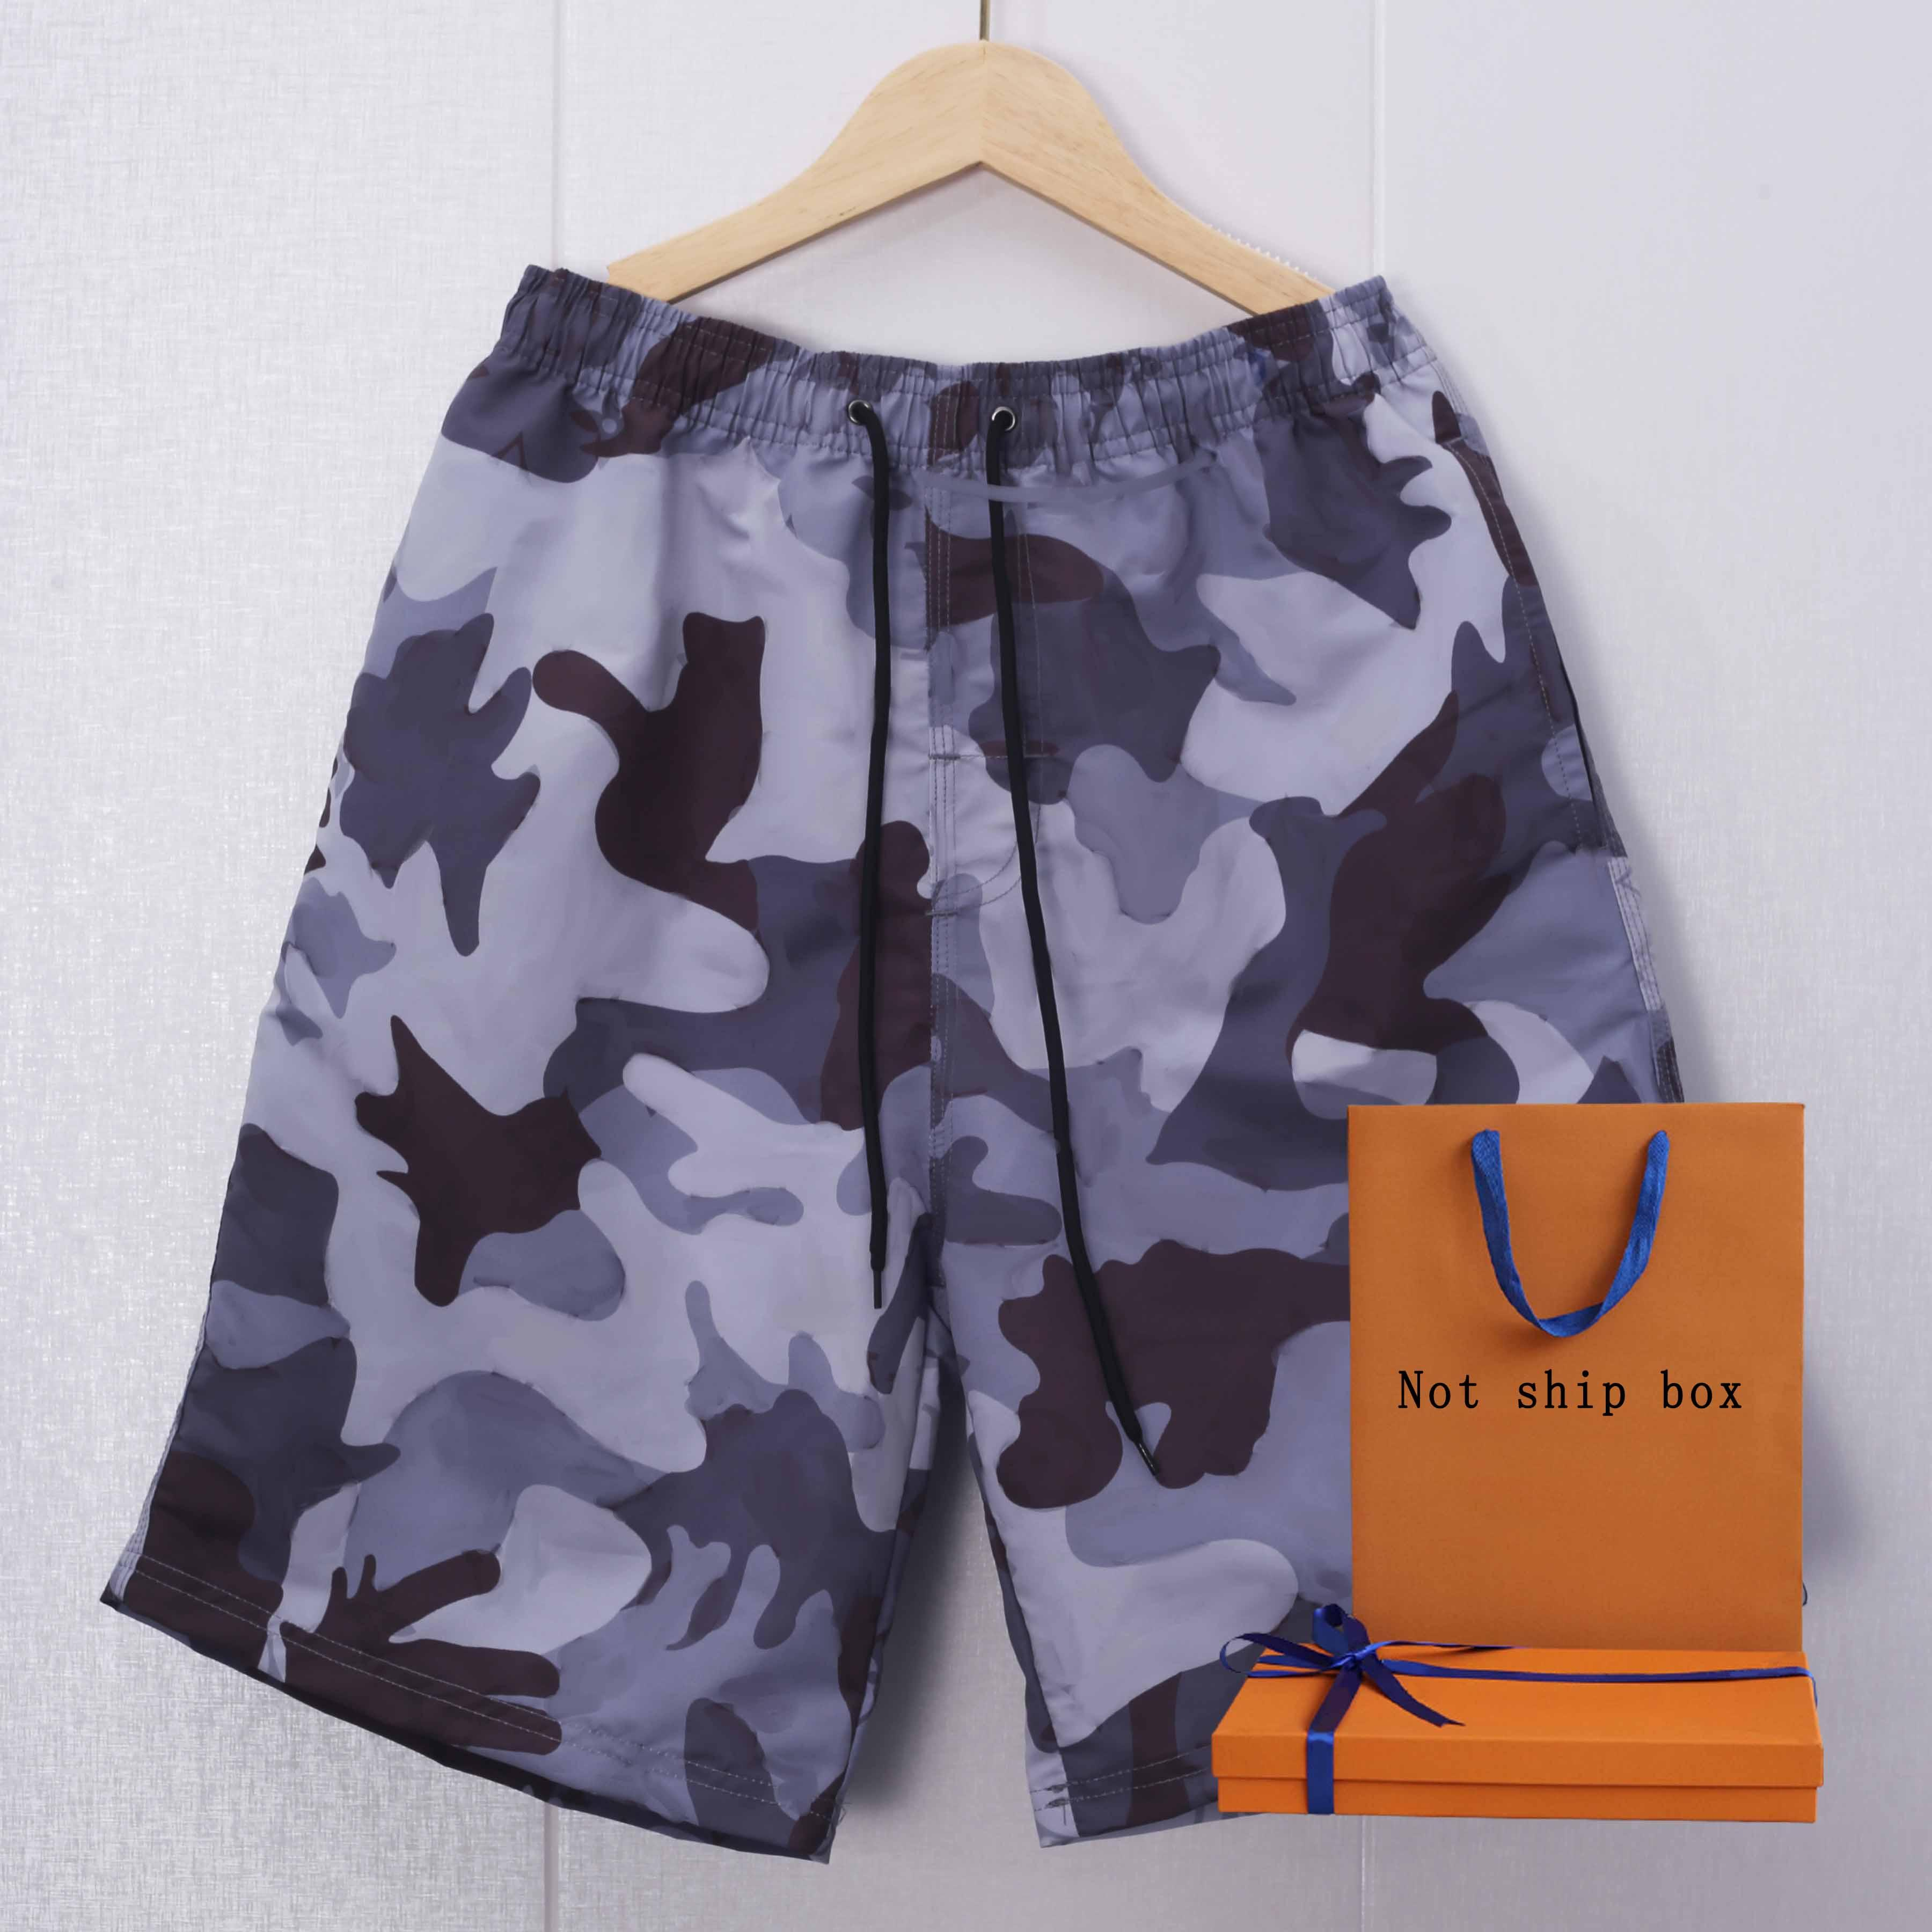 Masculino Swimwear 2021 Summer Beach Shorts Mens Swimpants Clássico Carta Padrão Contraste Color Adolescente Board Shorts